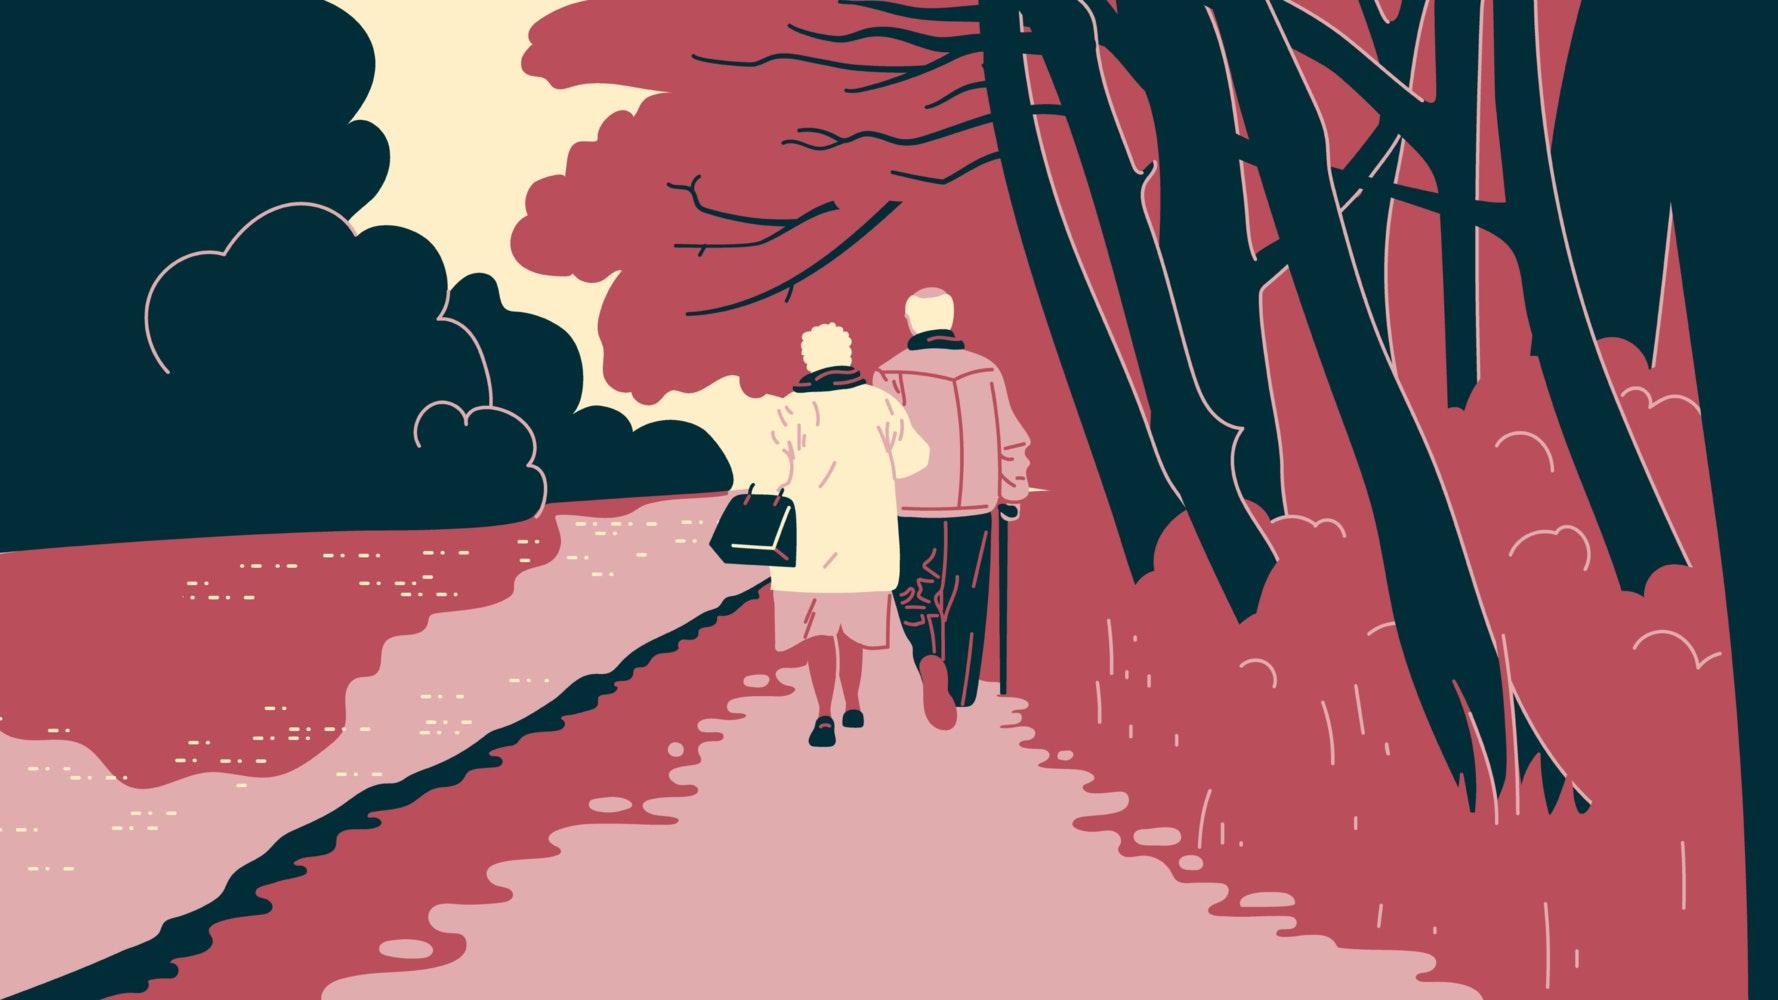 Elderly couple walking arm in arm through a park